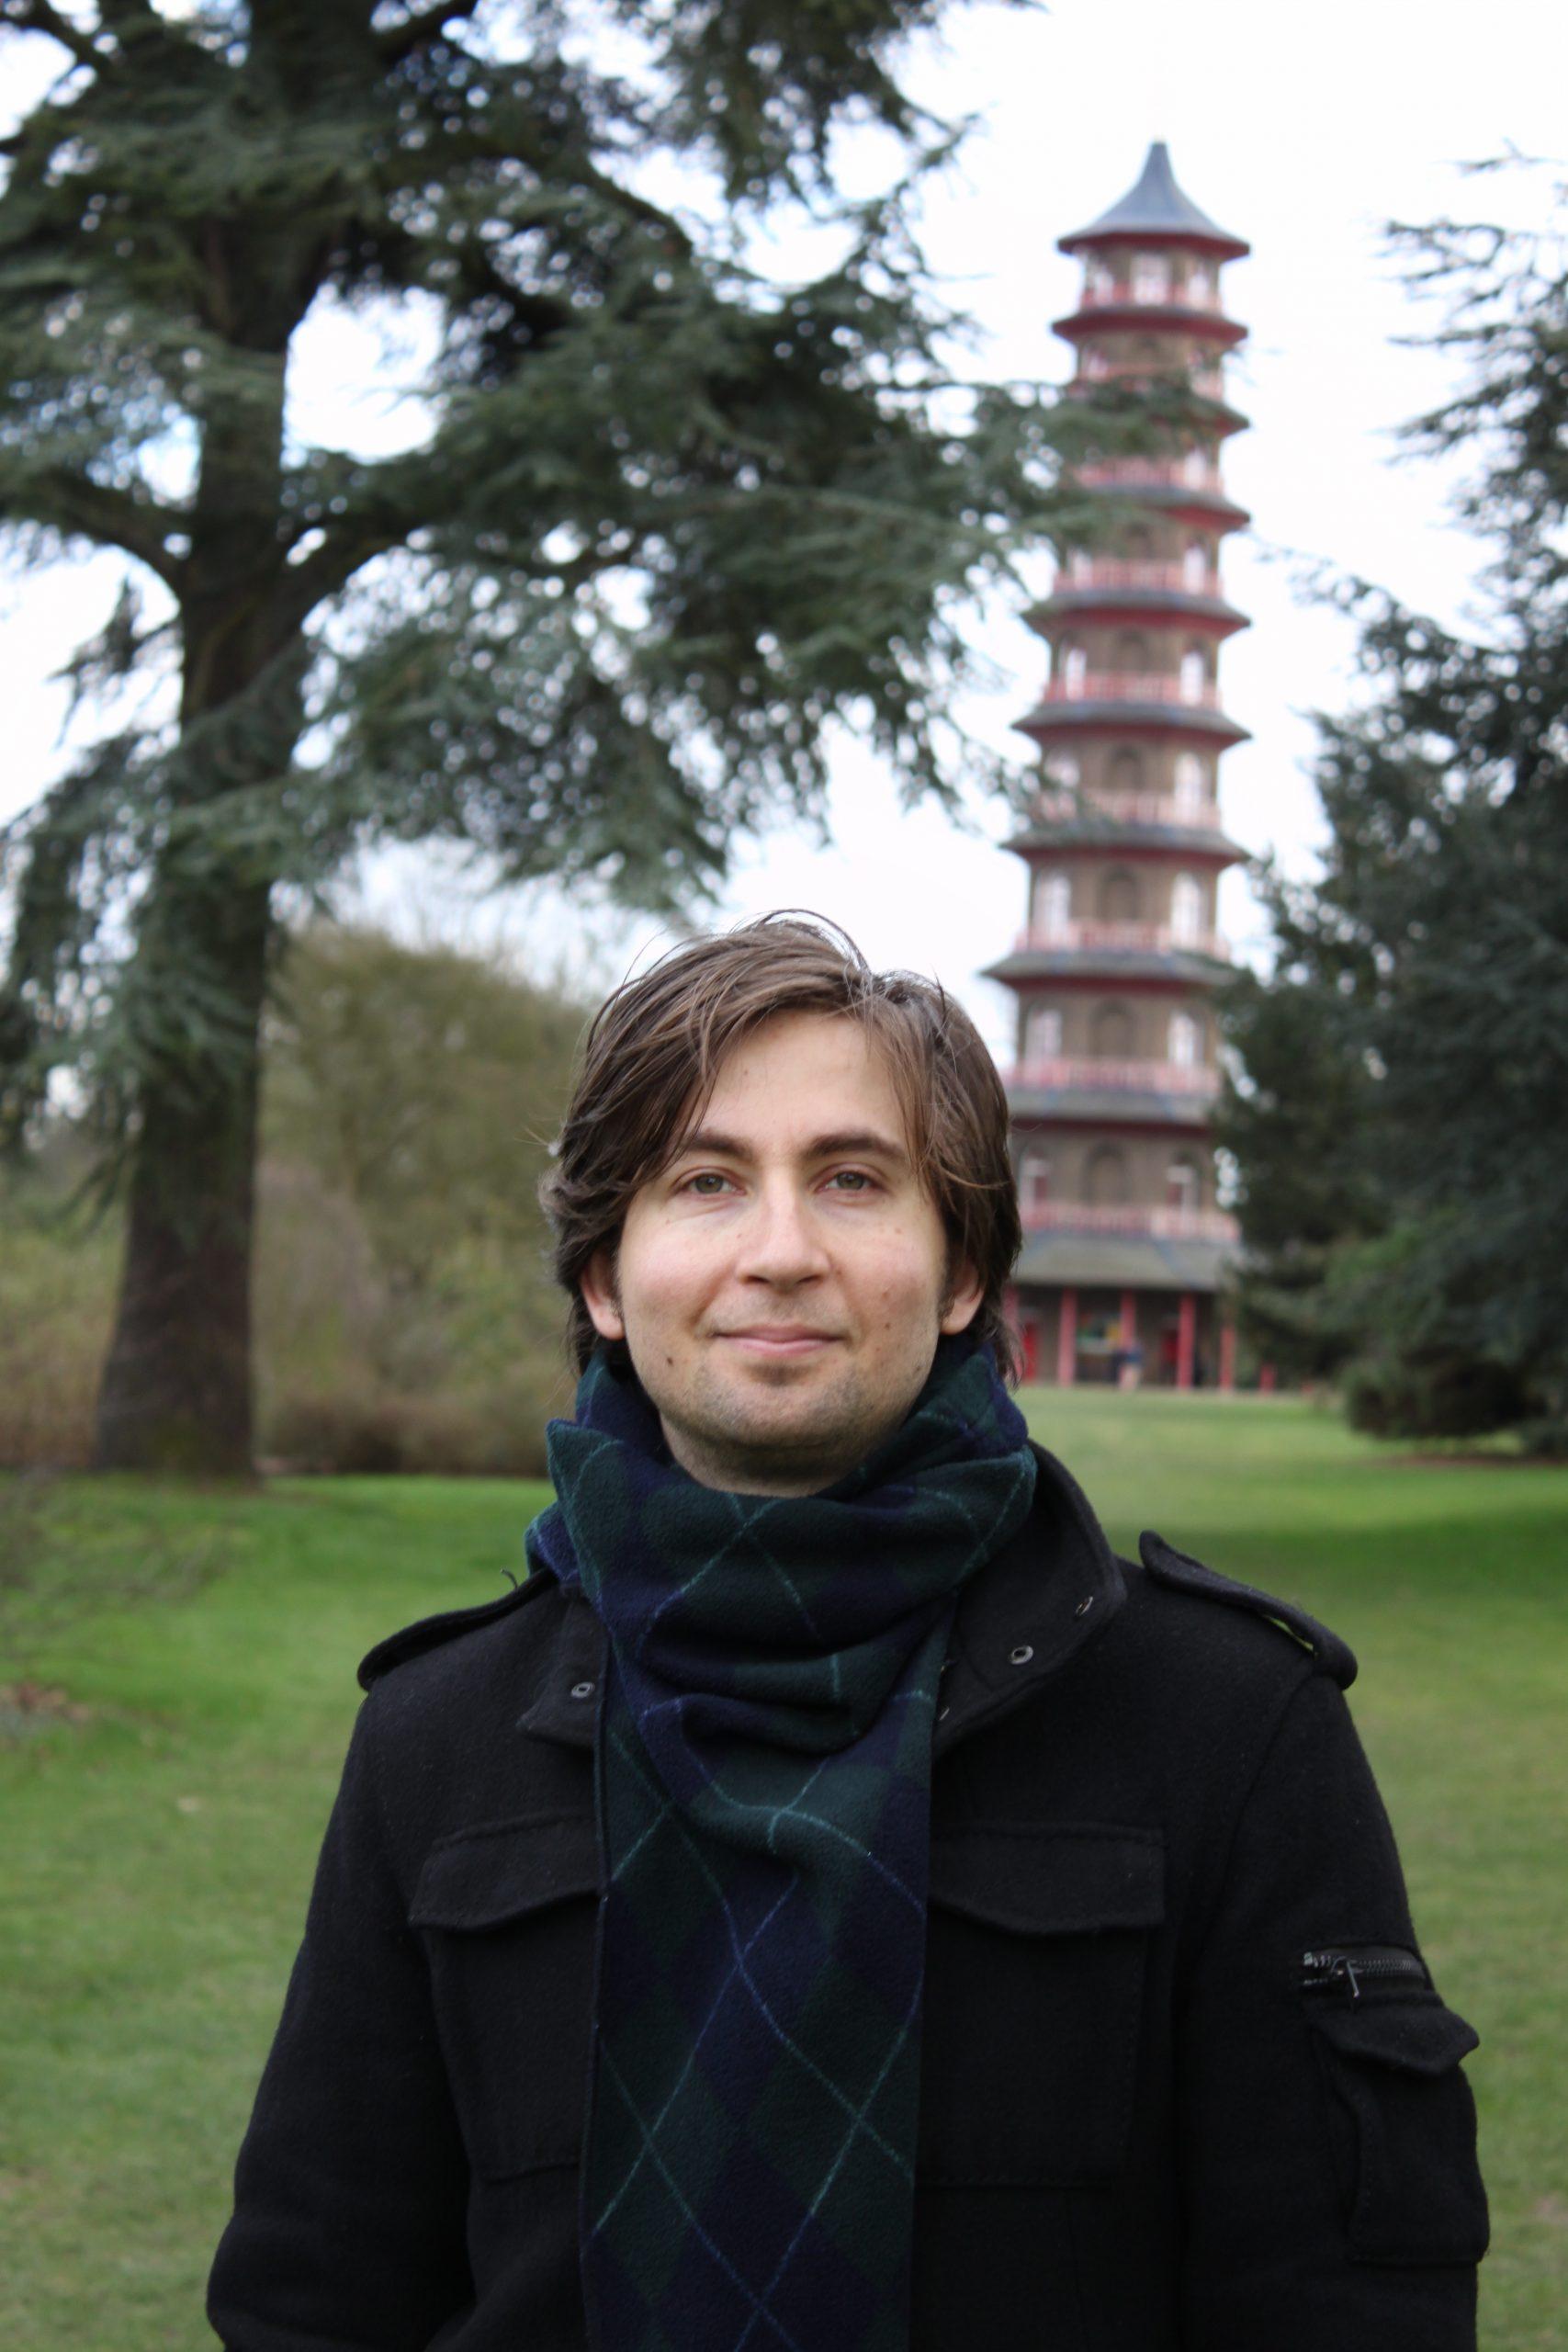 photo of author Etan Ilfeld